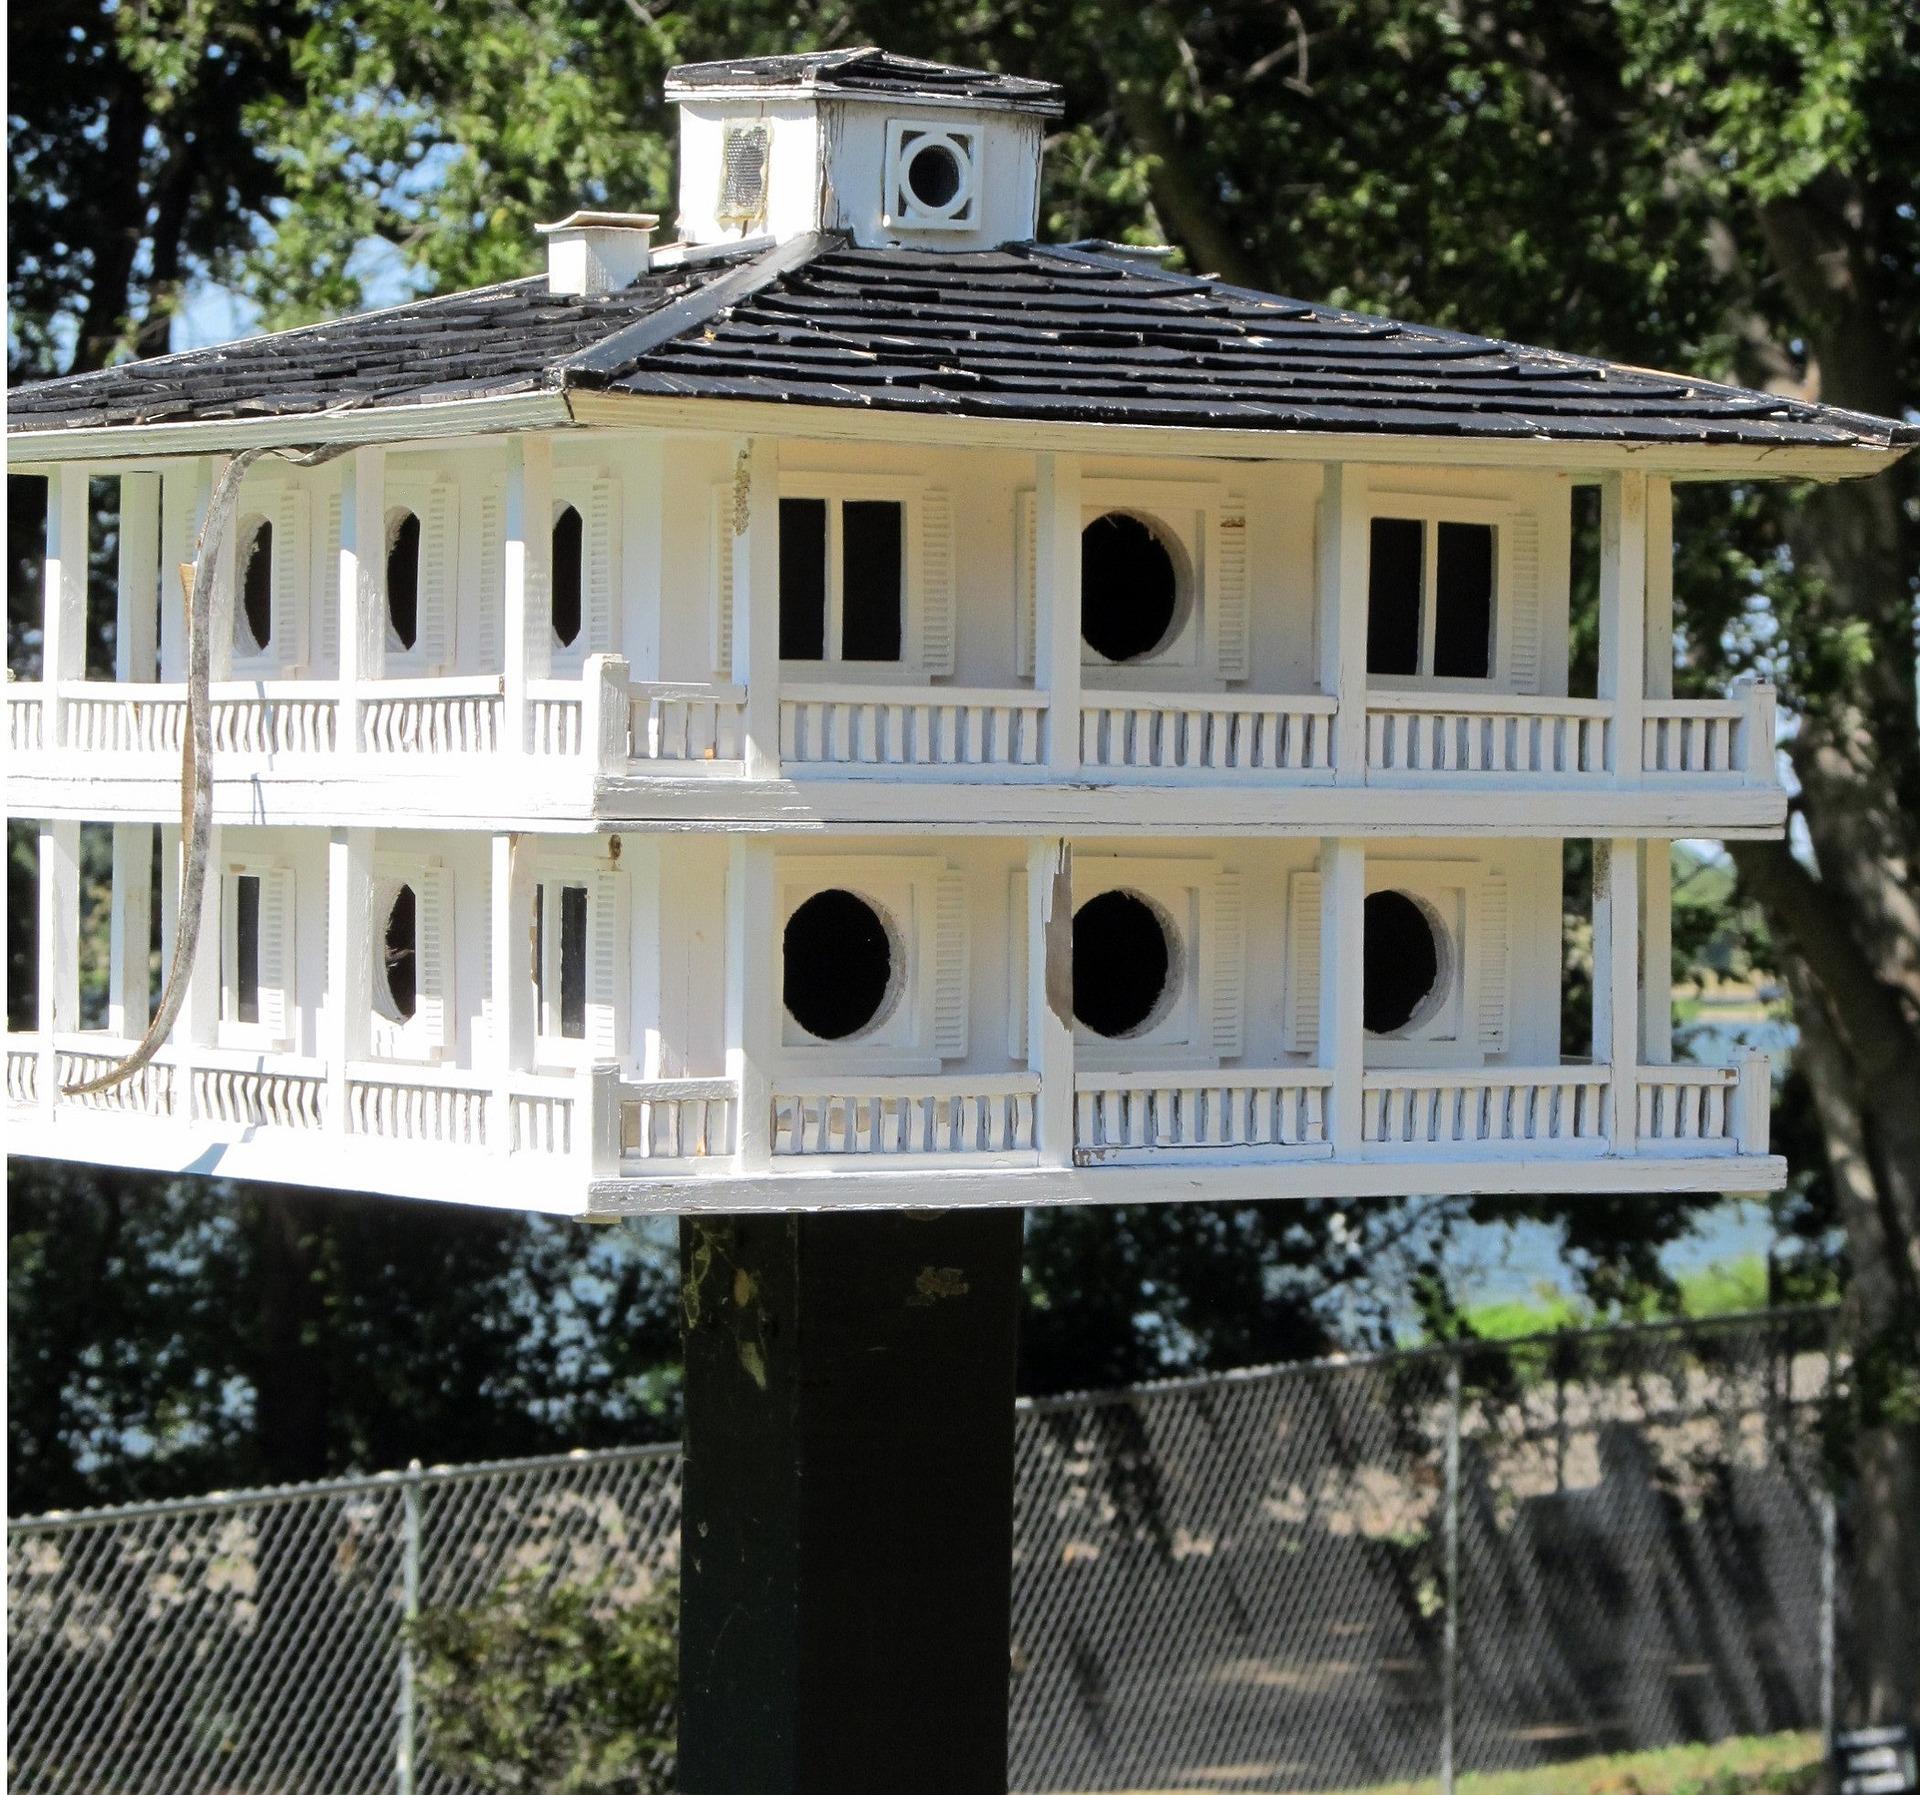 birdhouse - where are purple martins now